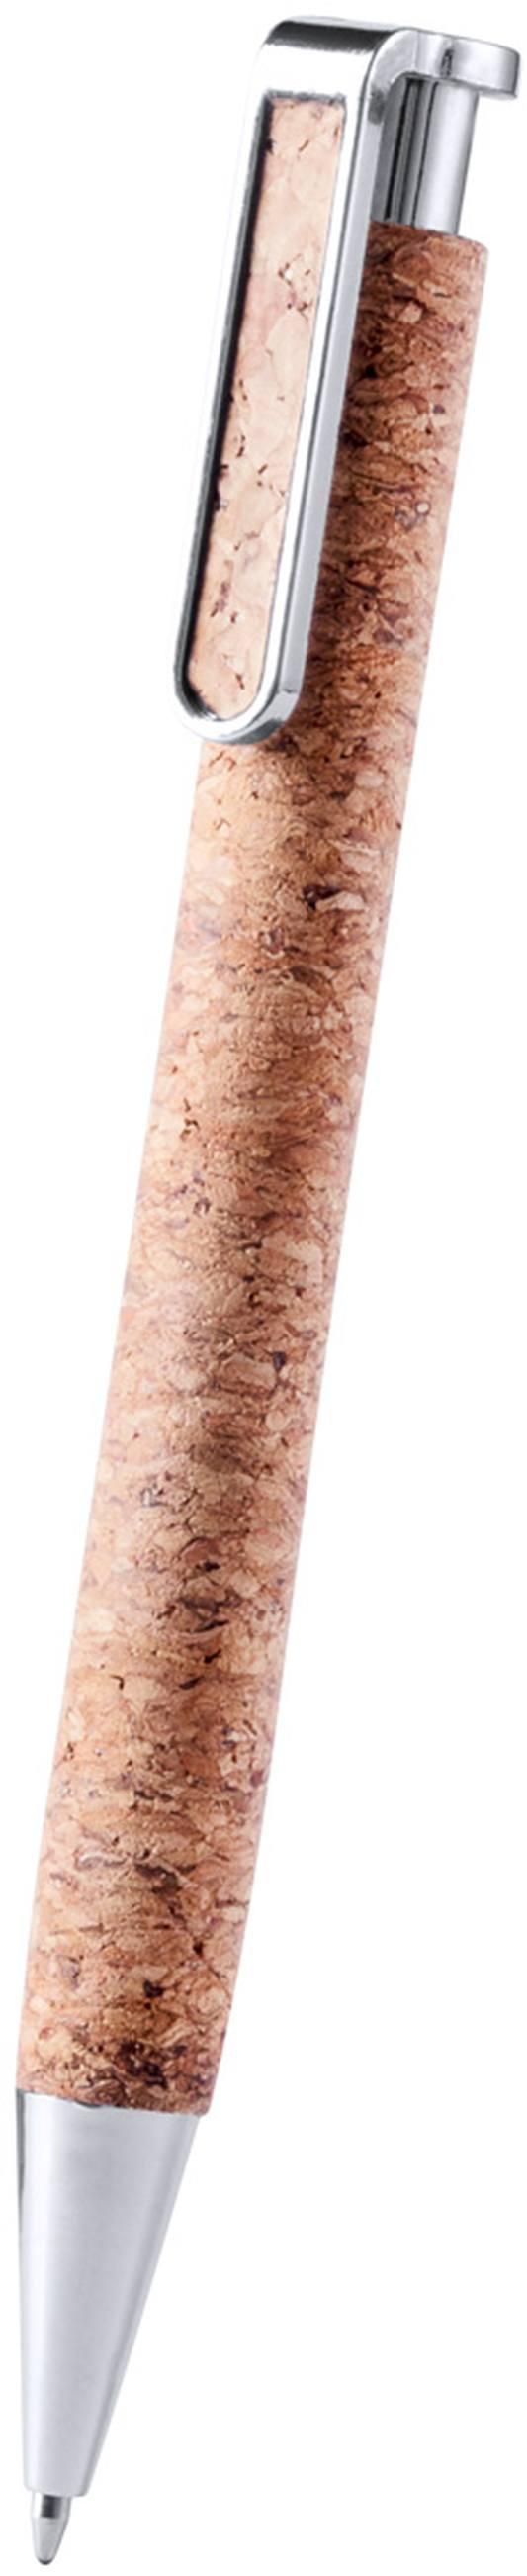 Rodwen kuličkové pero